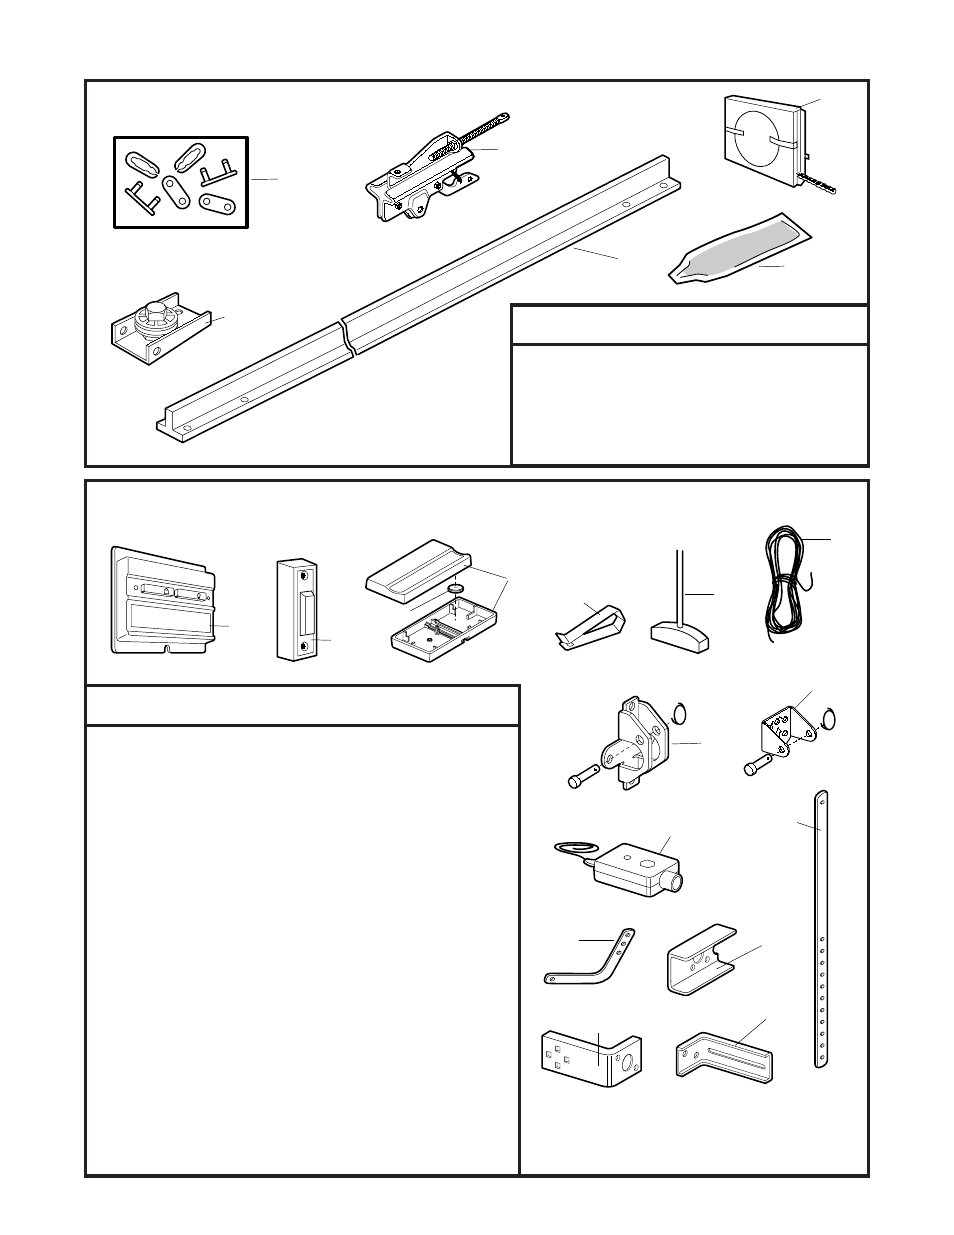 Repair parts, Rail assembly parts, Installation parts